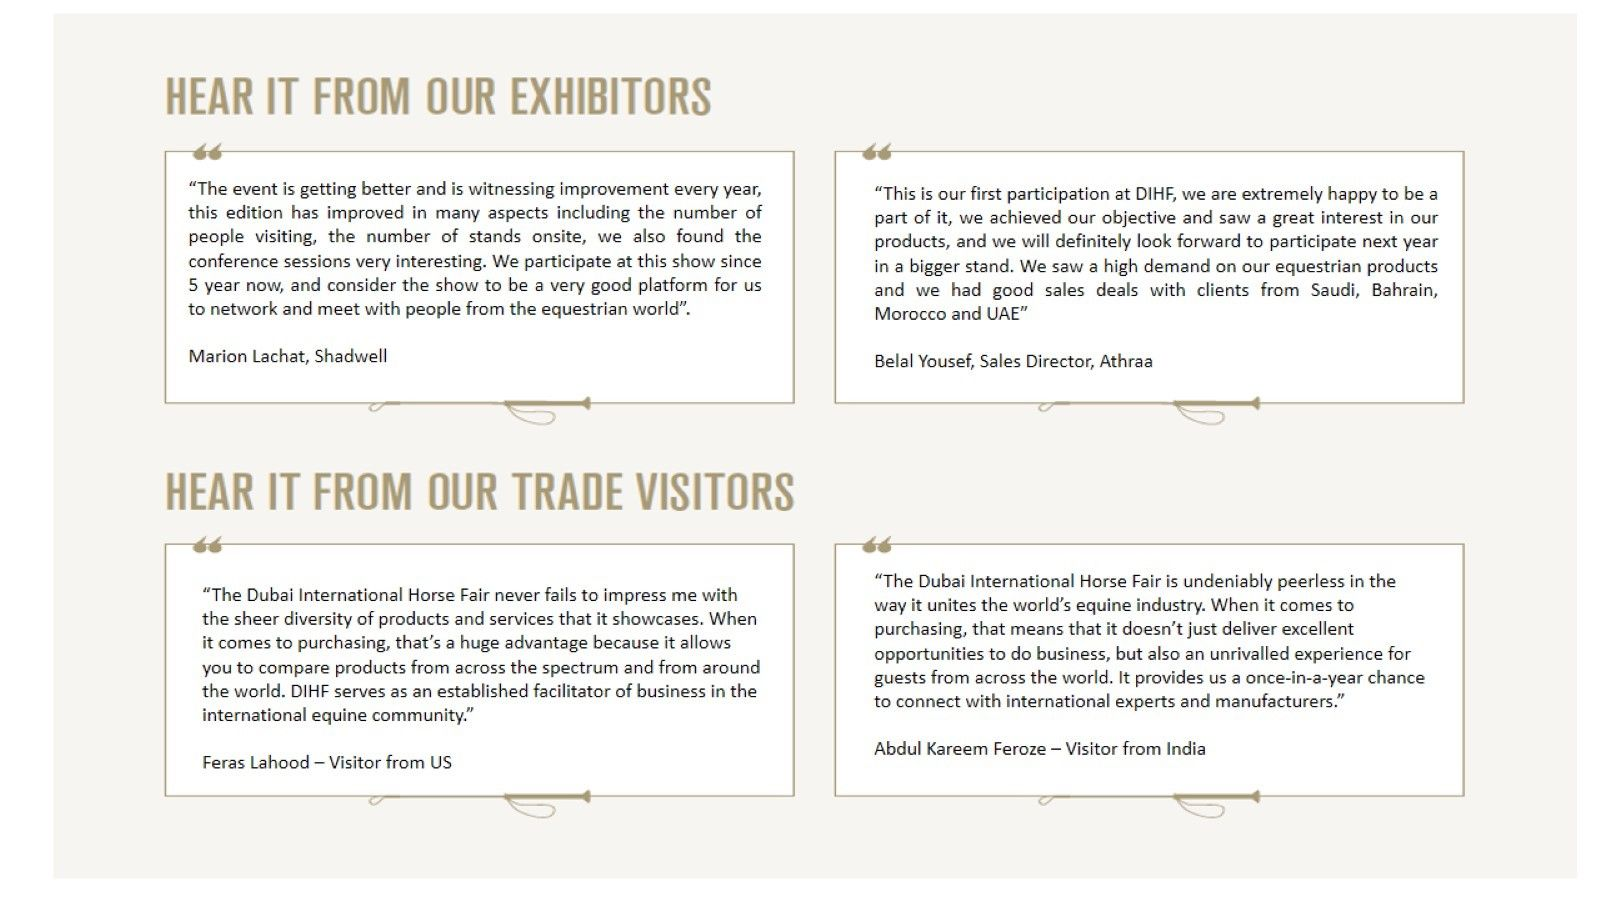 Exhibitors & Trade Buyers Testimonials